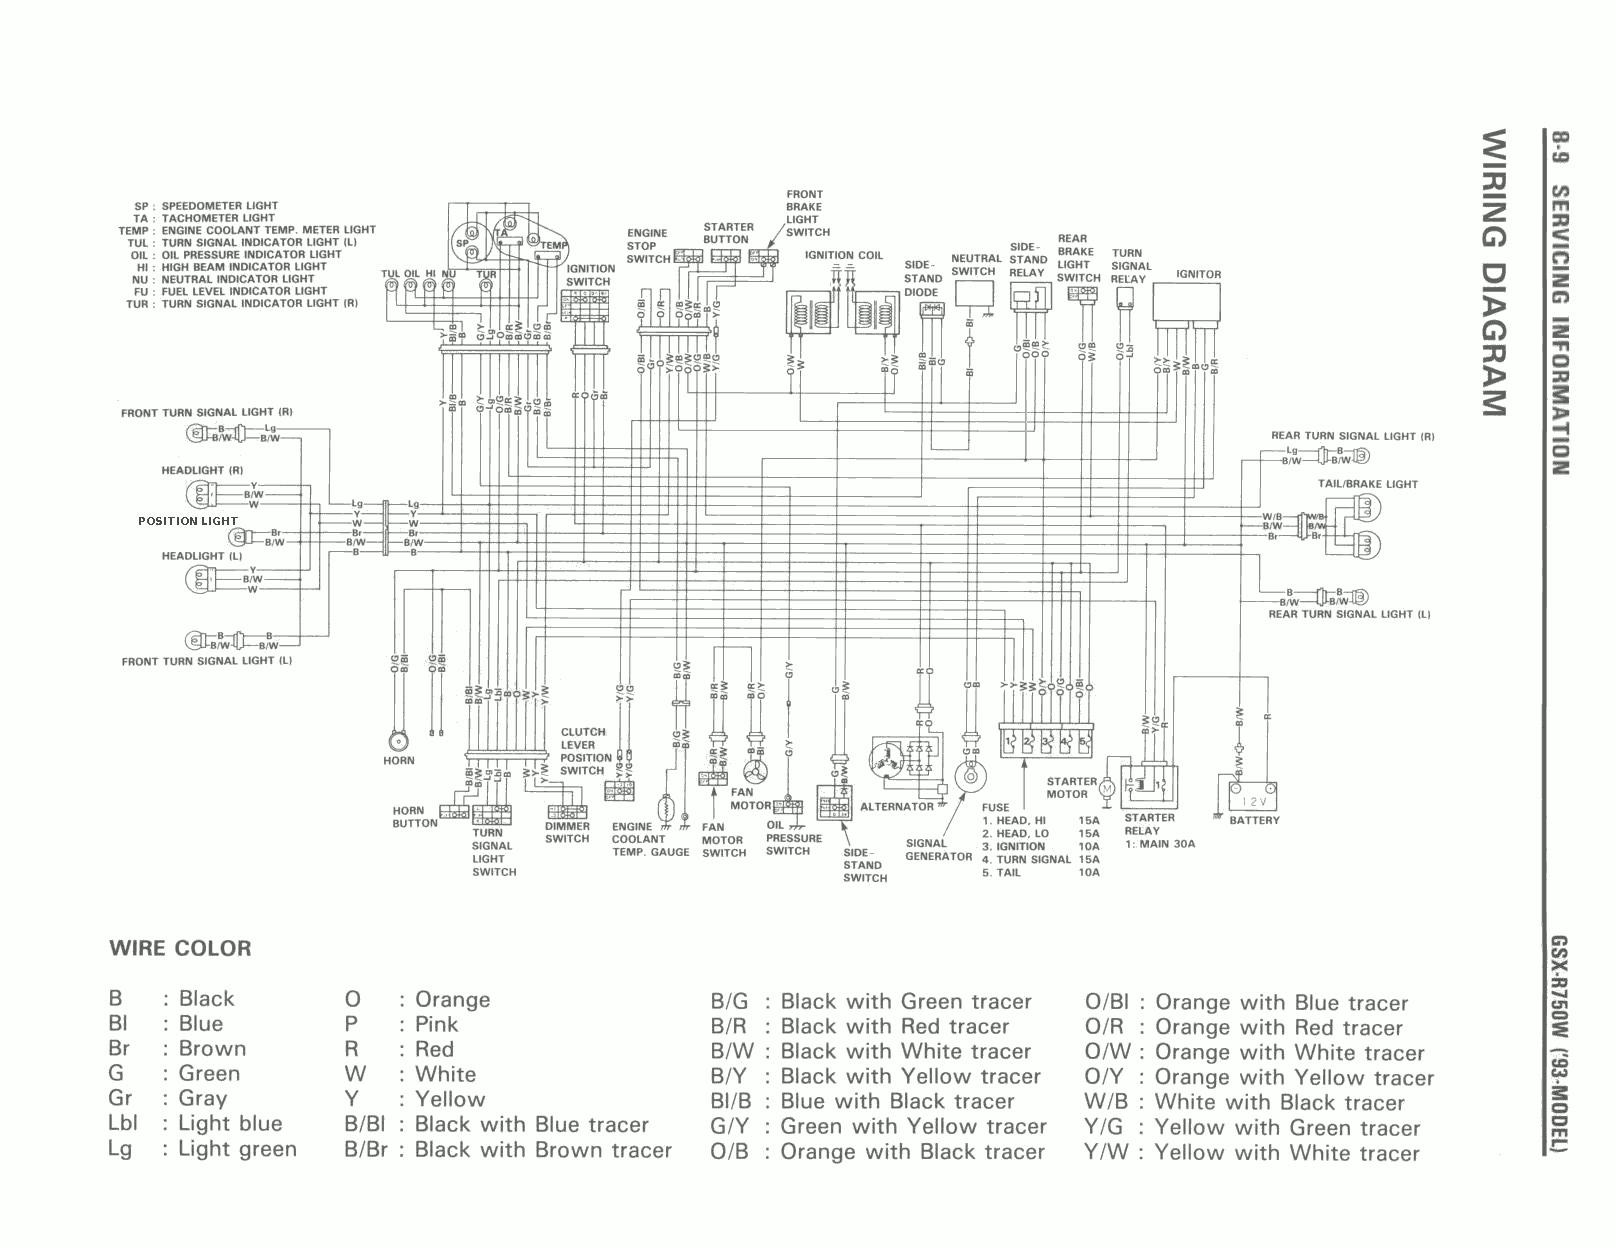 micro mini sprint wiring diagram 2005 cbr 600rr rollback wire harness, Wiring diagram